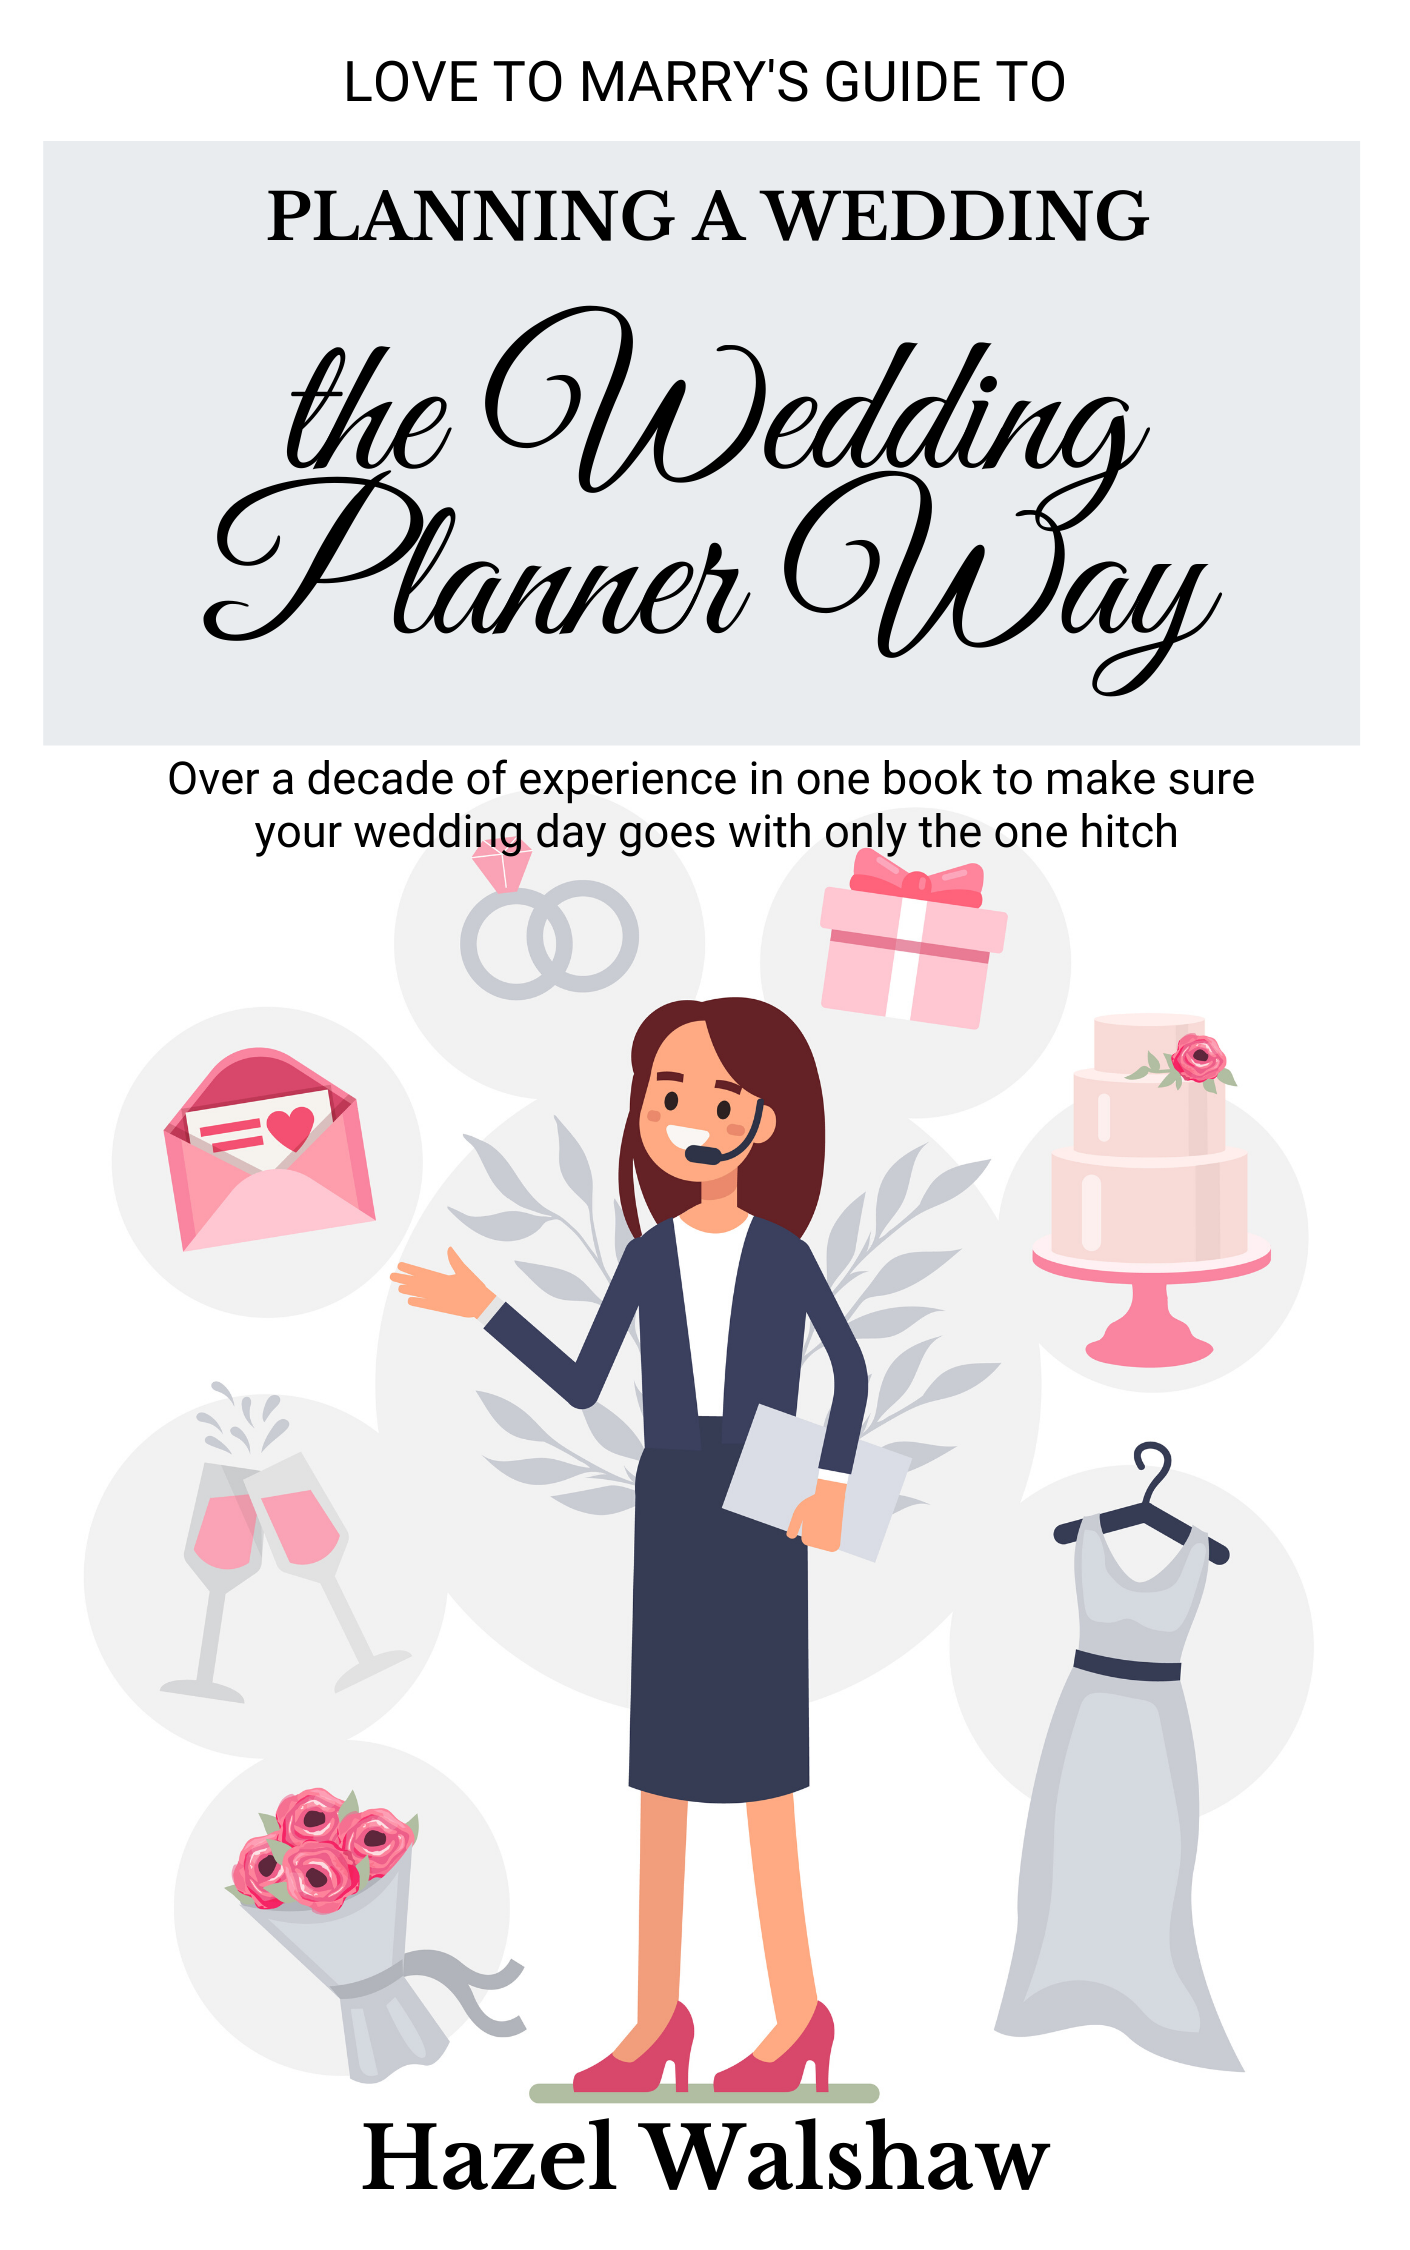 Planning a Wedding the Wedding Planner Way's Ebook Image